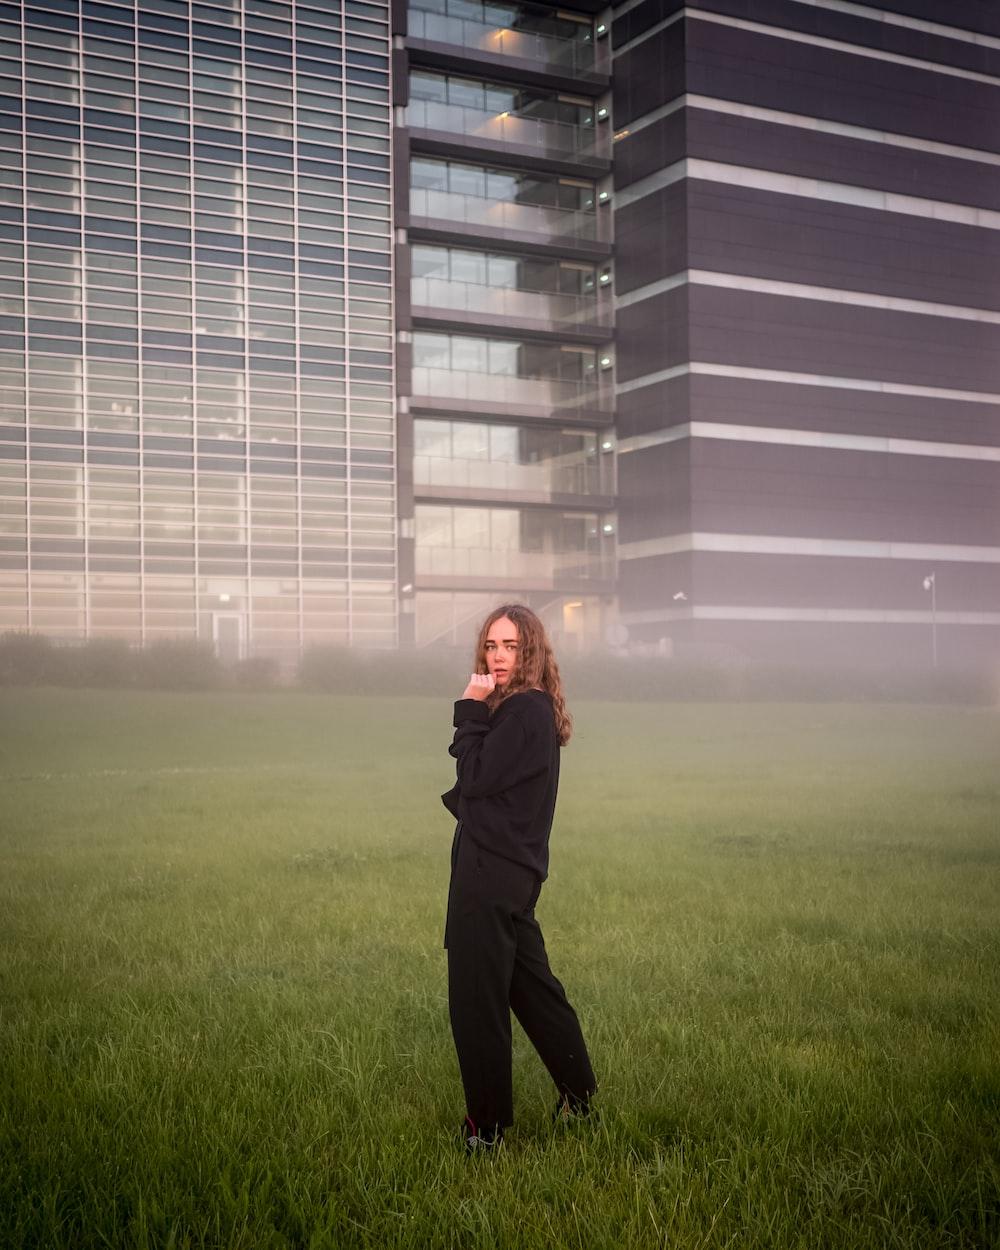 woman in black jacket standing on green grass field